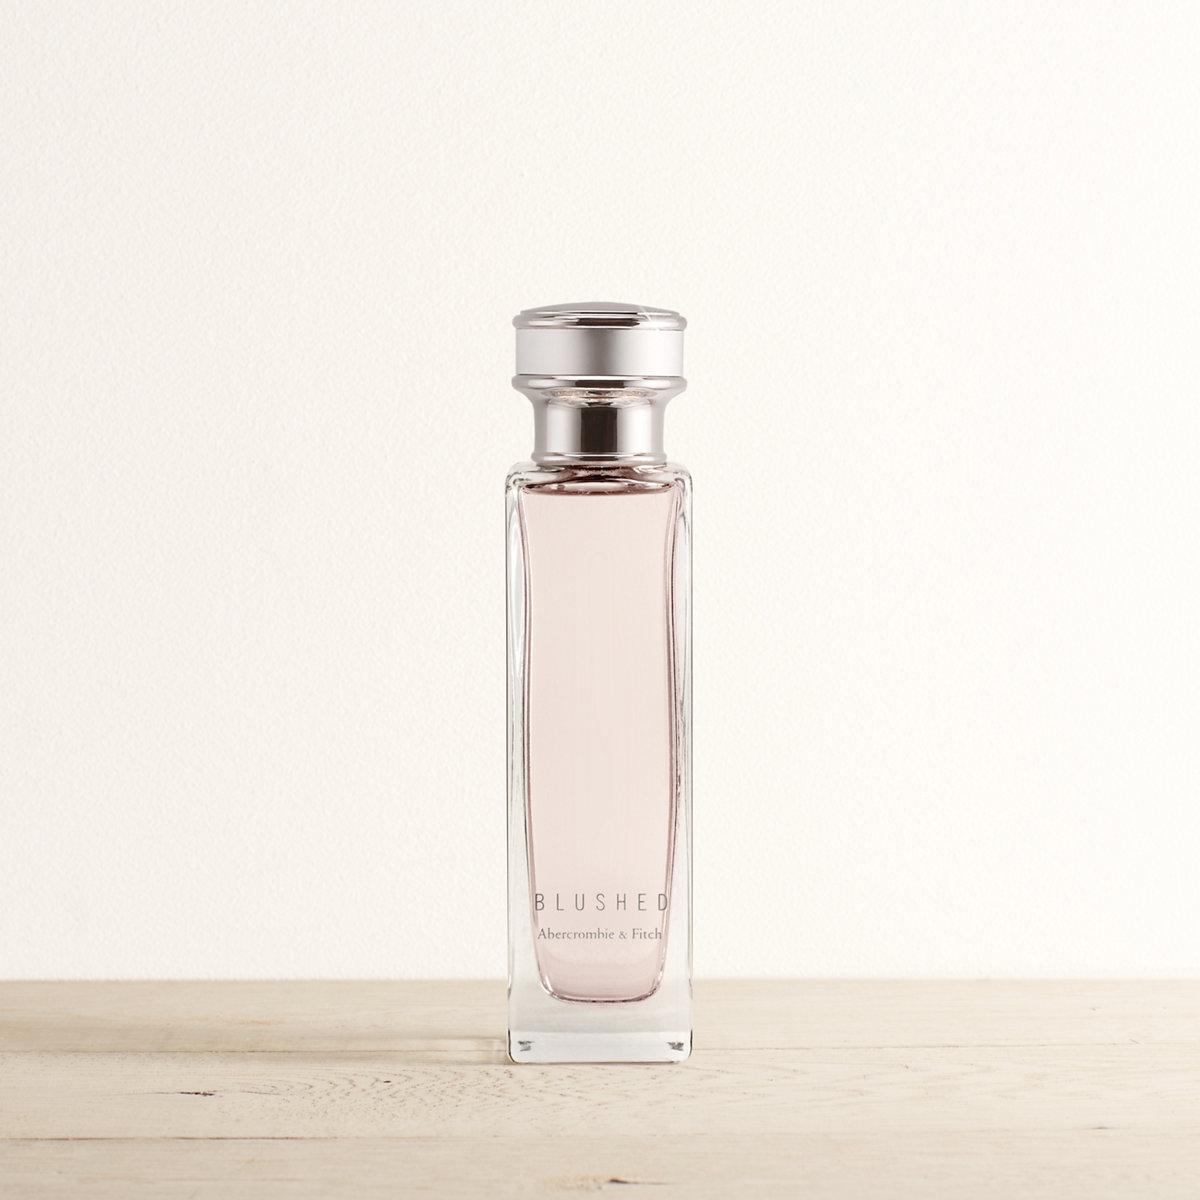 Blushed Perfume